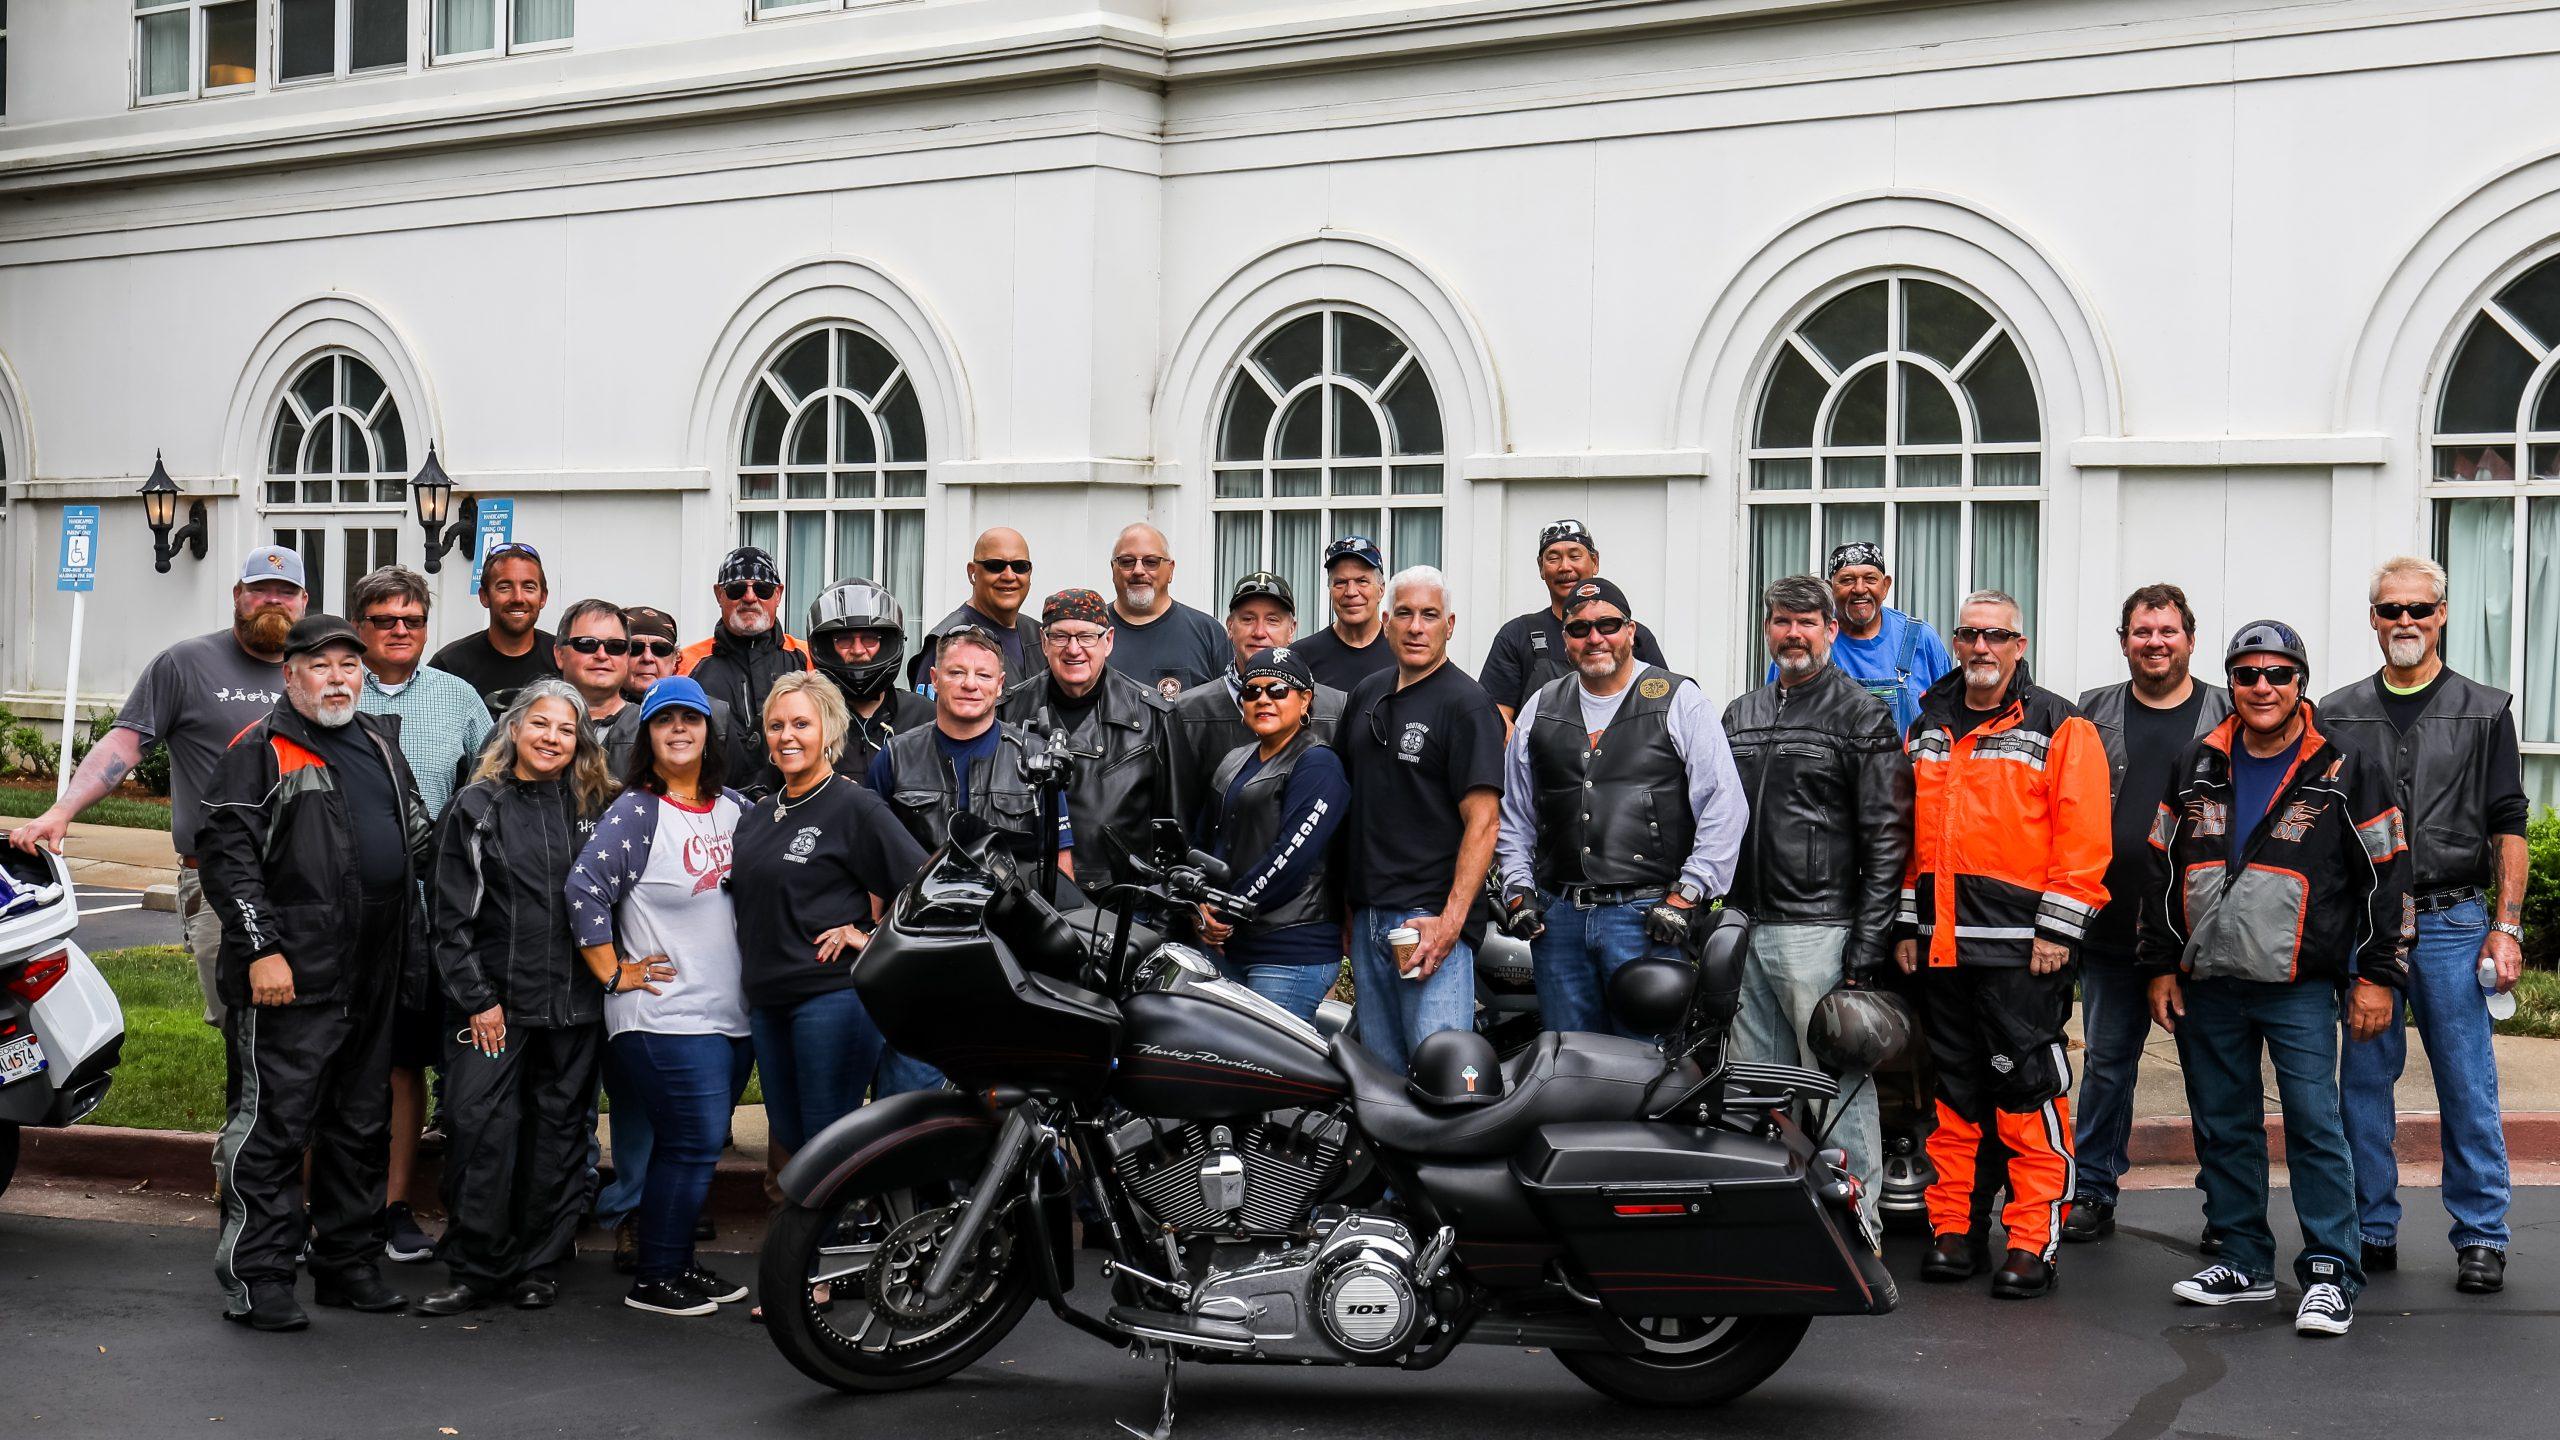 Kourpias K-9 Classic Motorcycle Ride Raises $100K for GDA